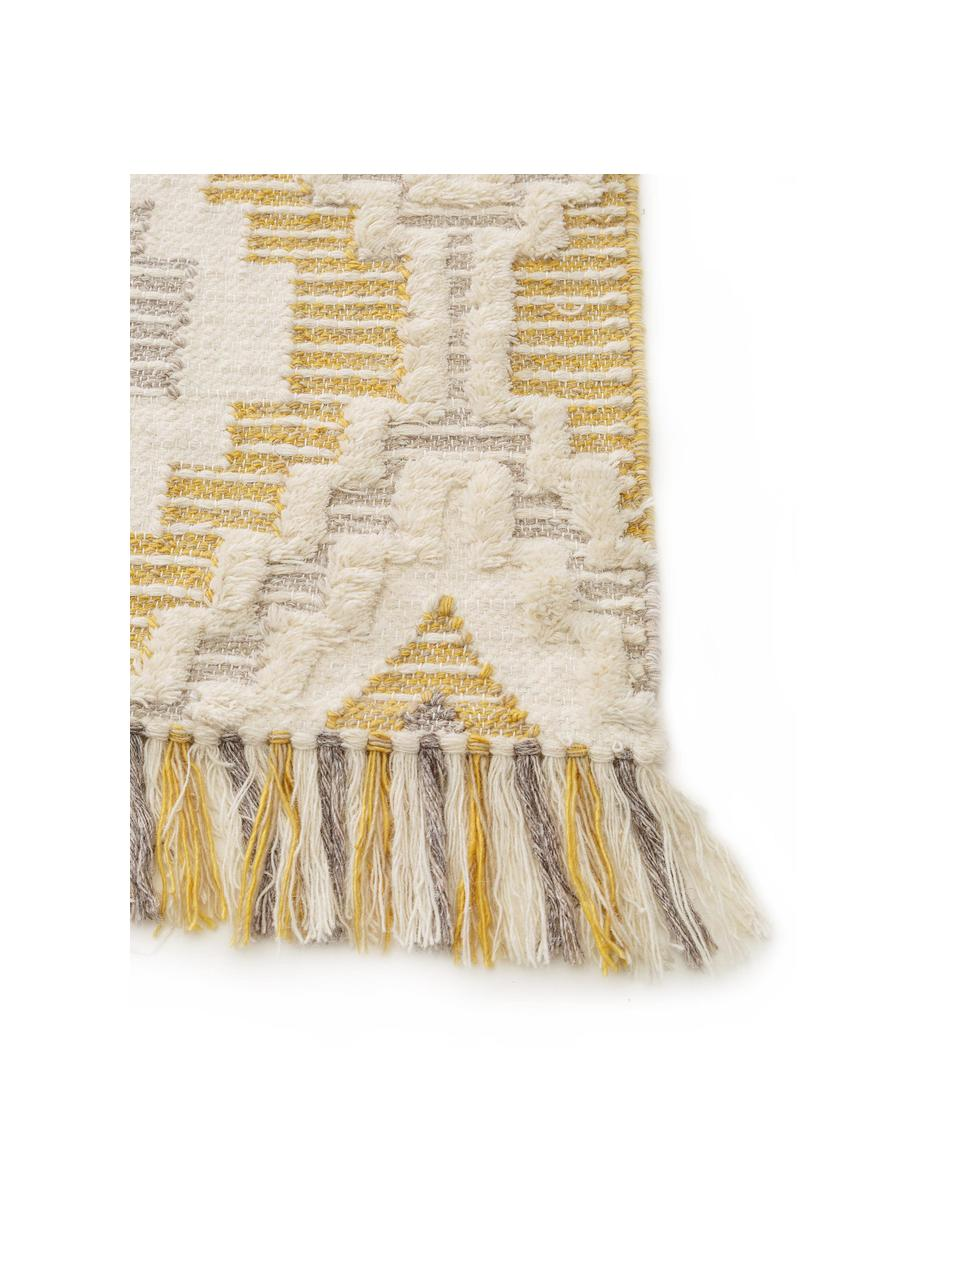 Tapis en laine jaune gris ethnique Wanda, Jaune, gris, crème